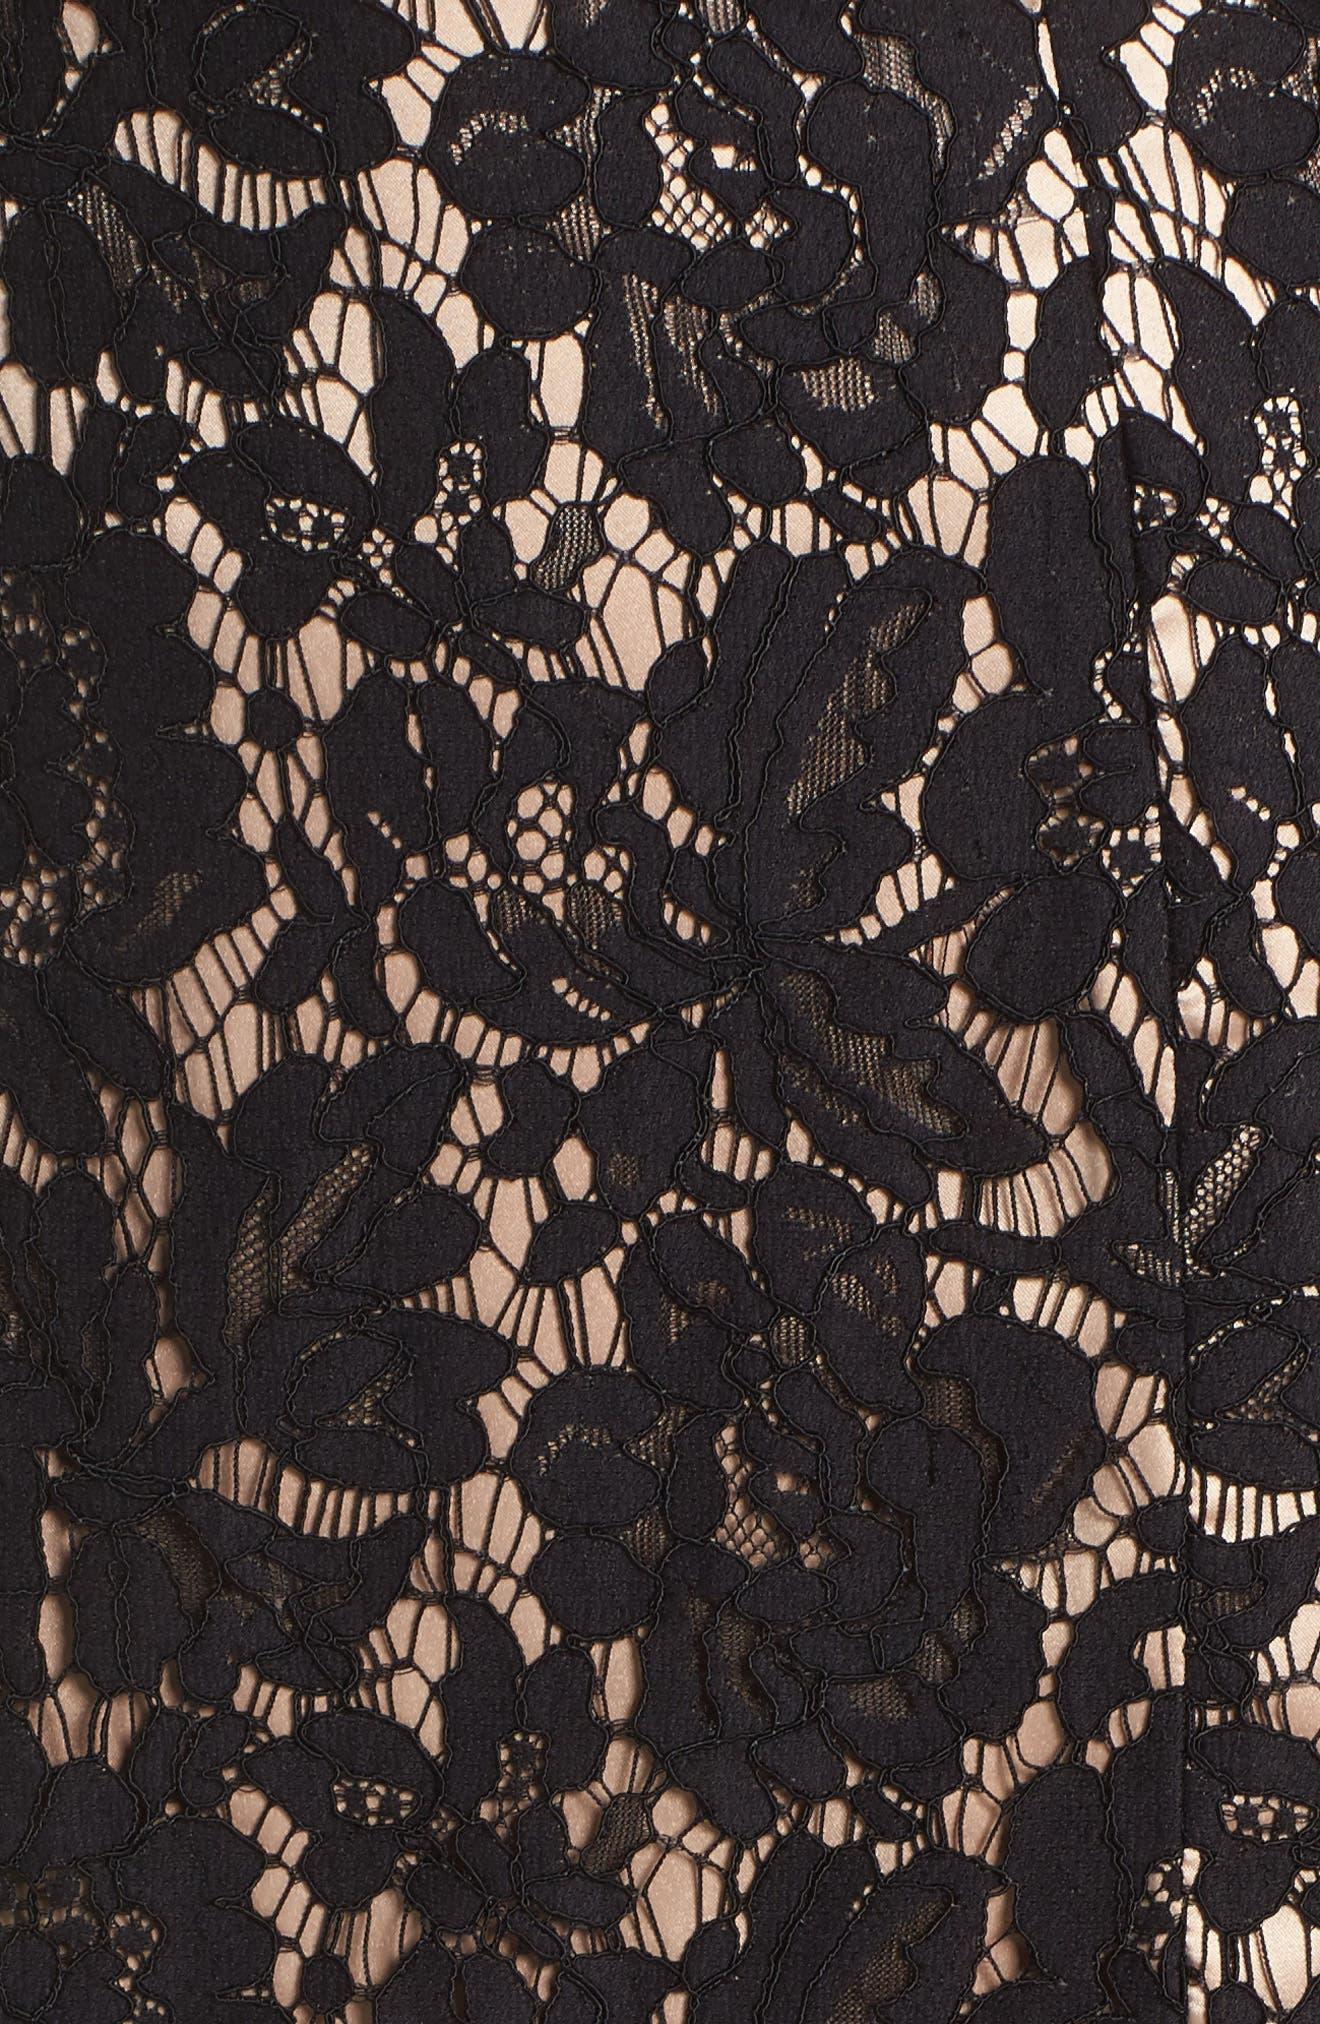 Lace Off the Shoulder Midi Dress,                             Alternate thumbnail 5, color,                             Black